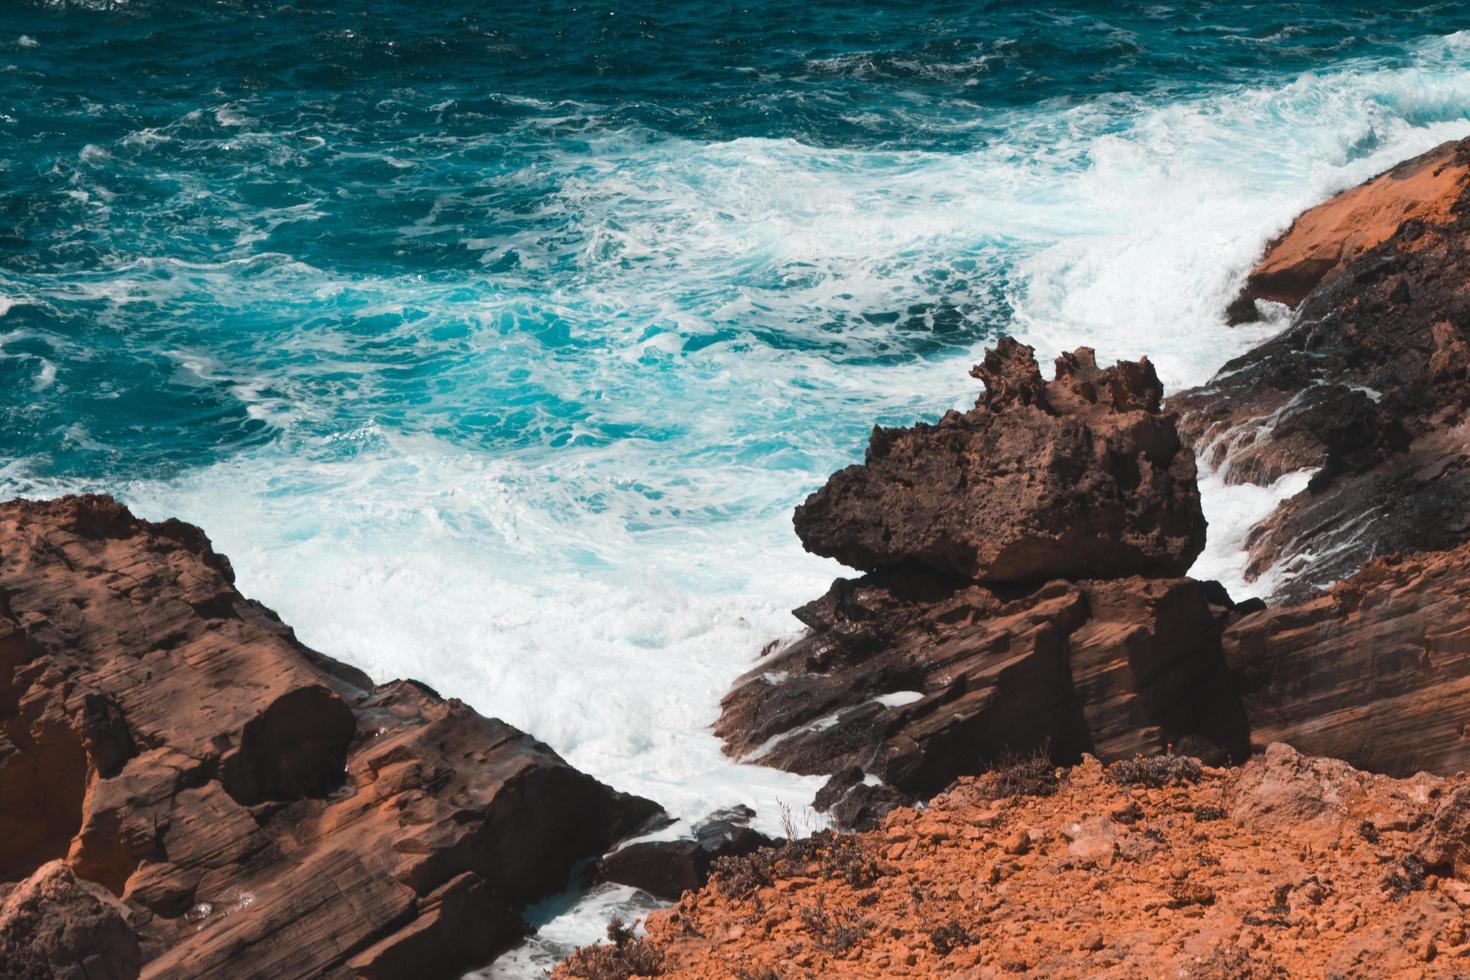 Waves crashing into rocky seashore photo